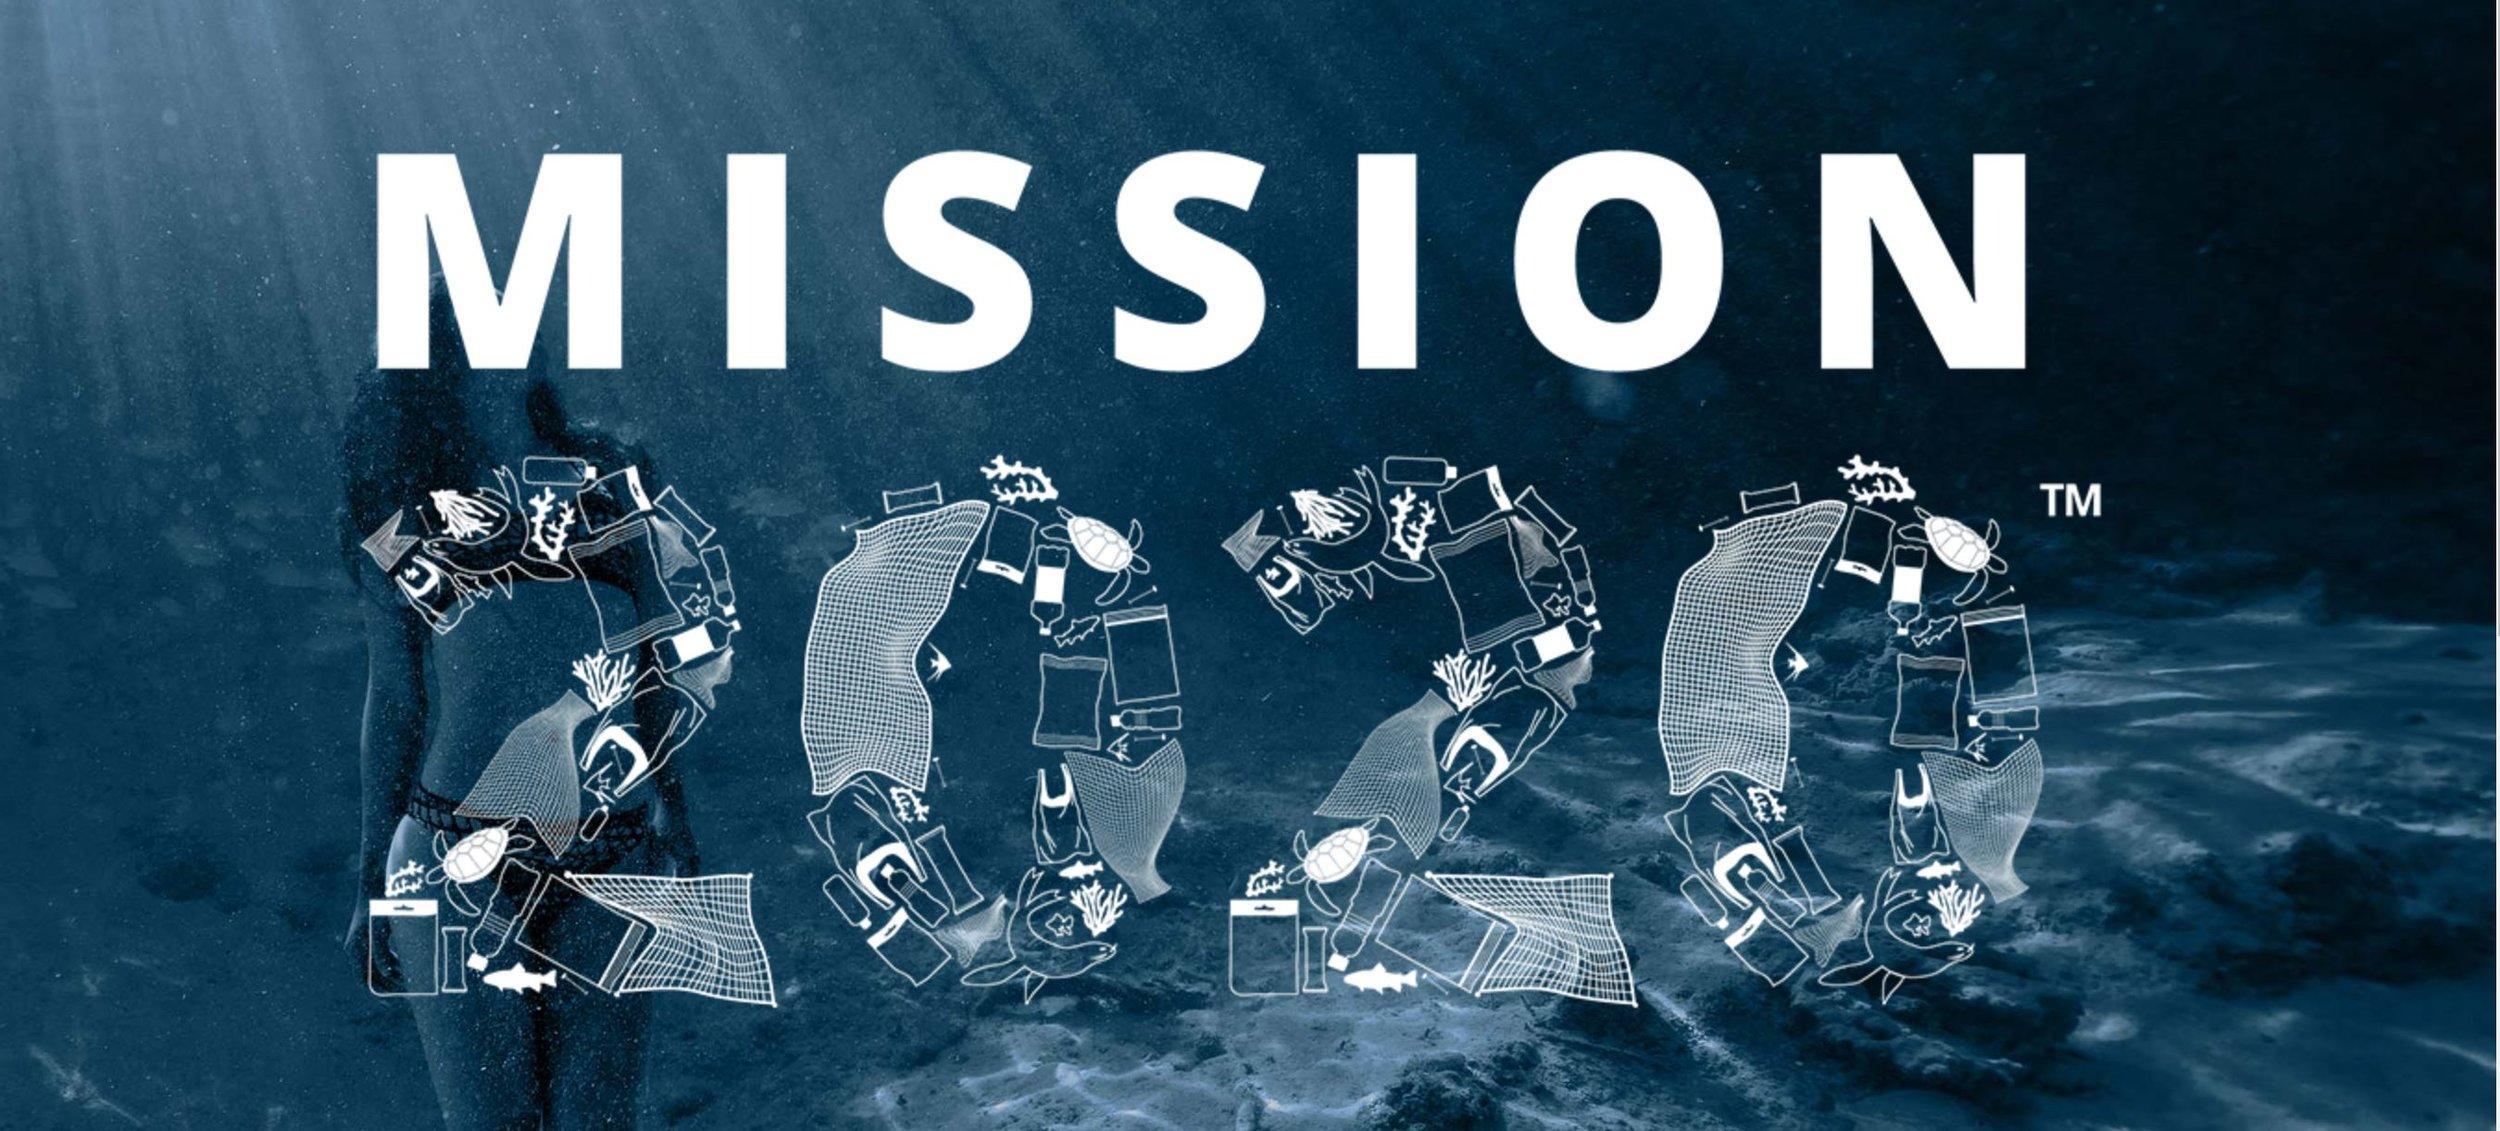 mission2020.JPG